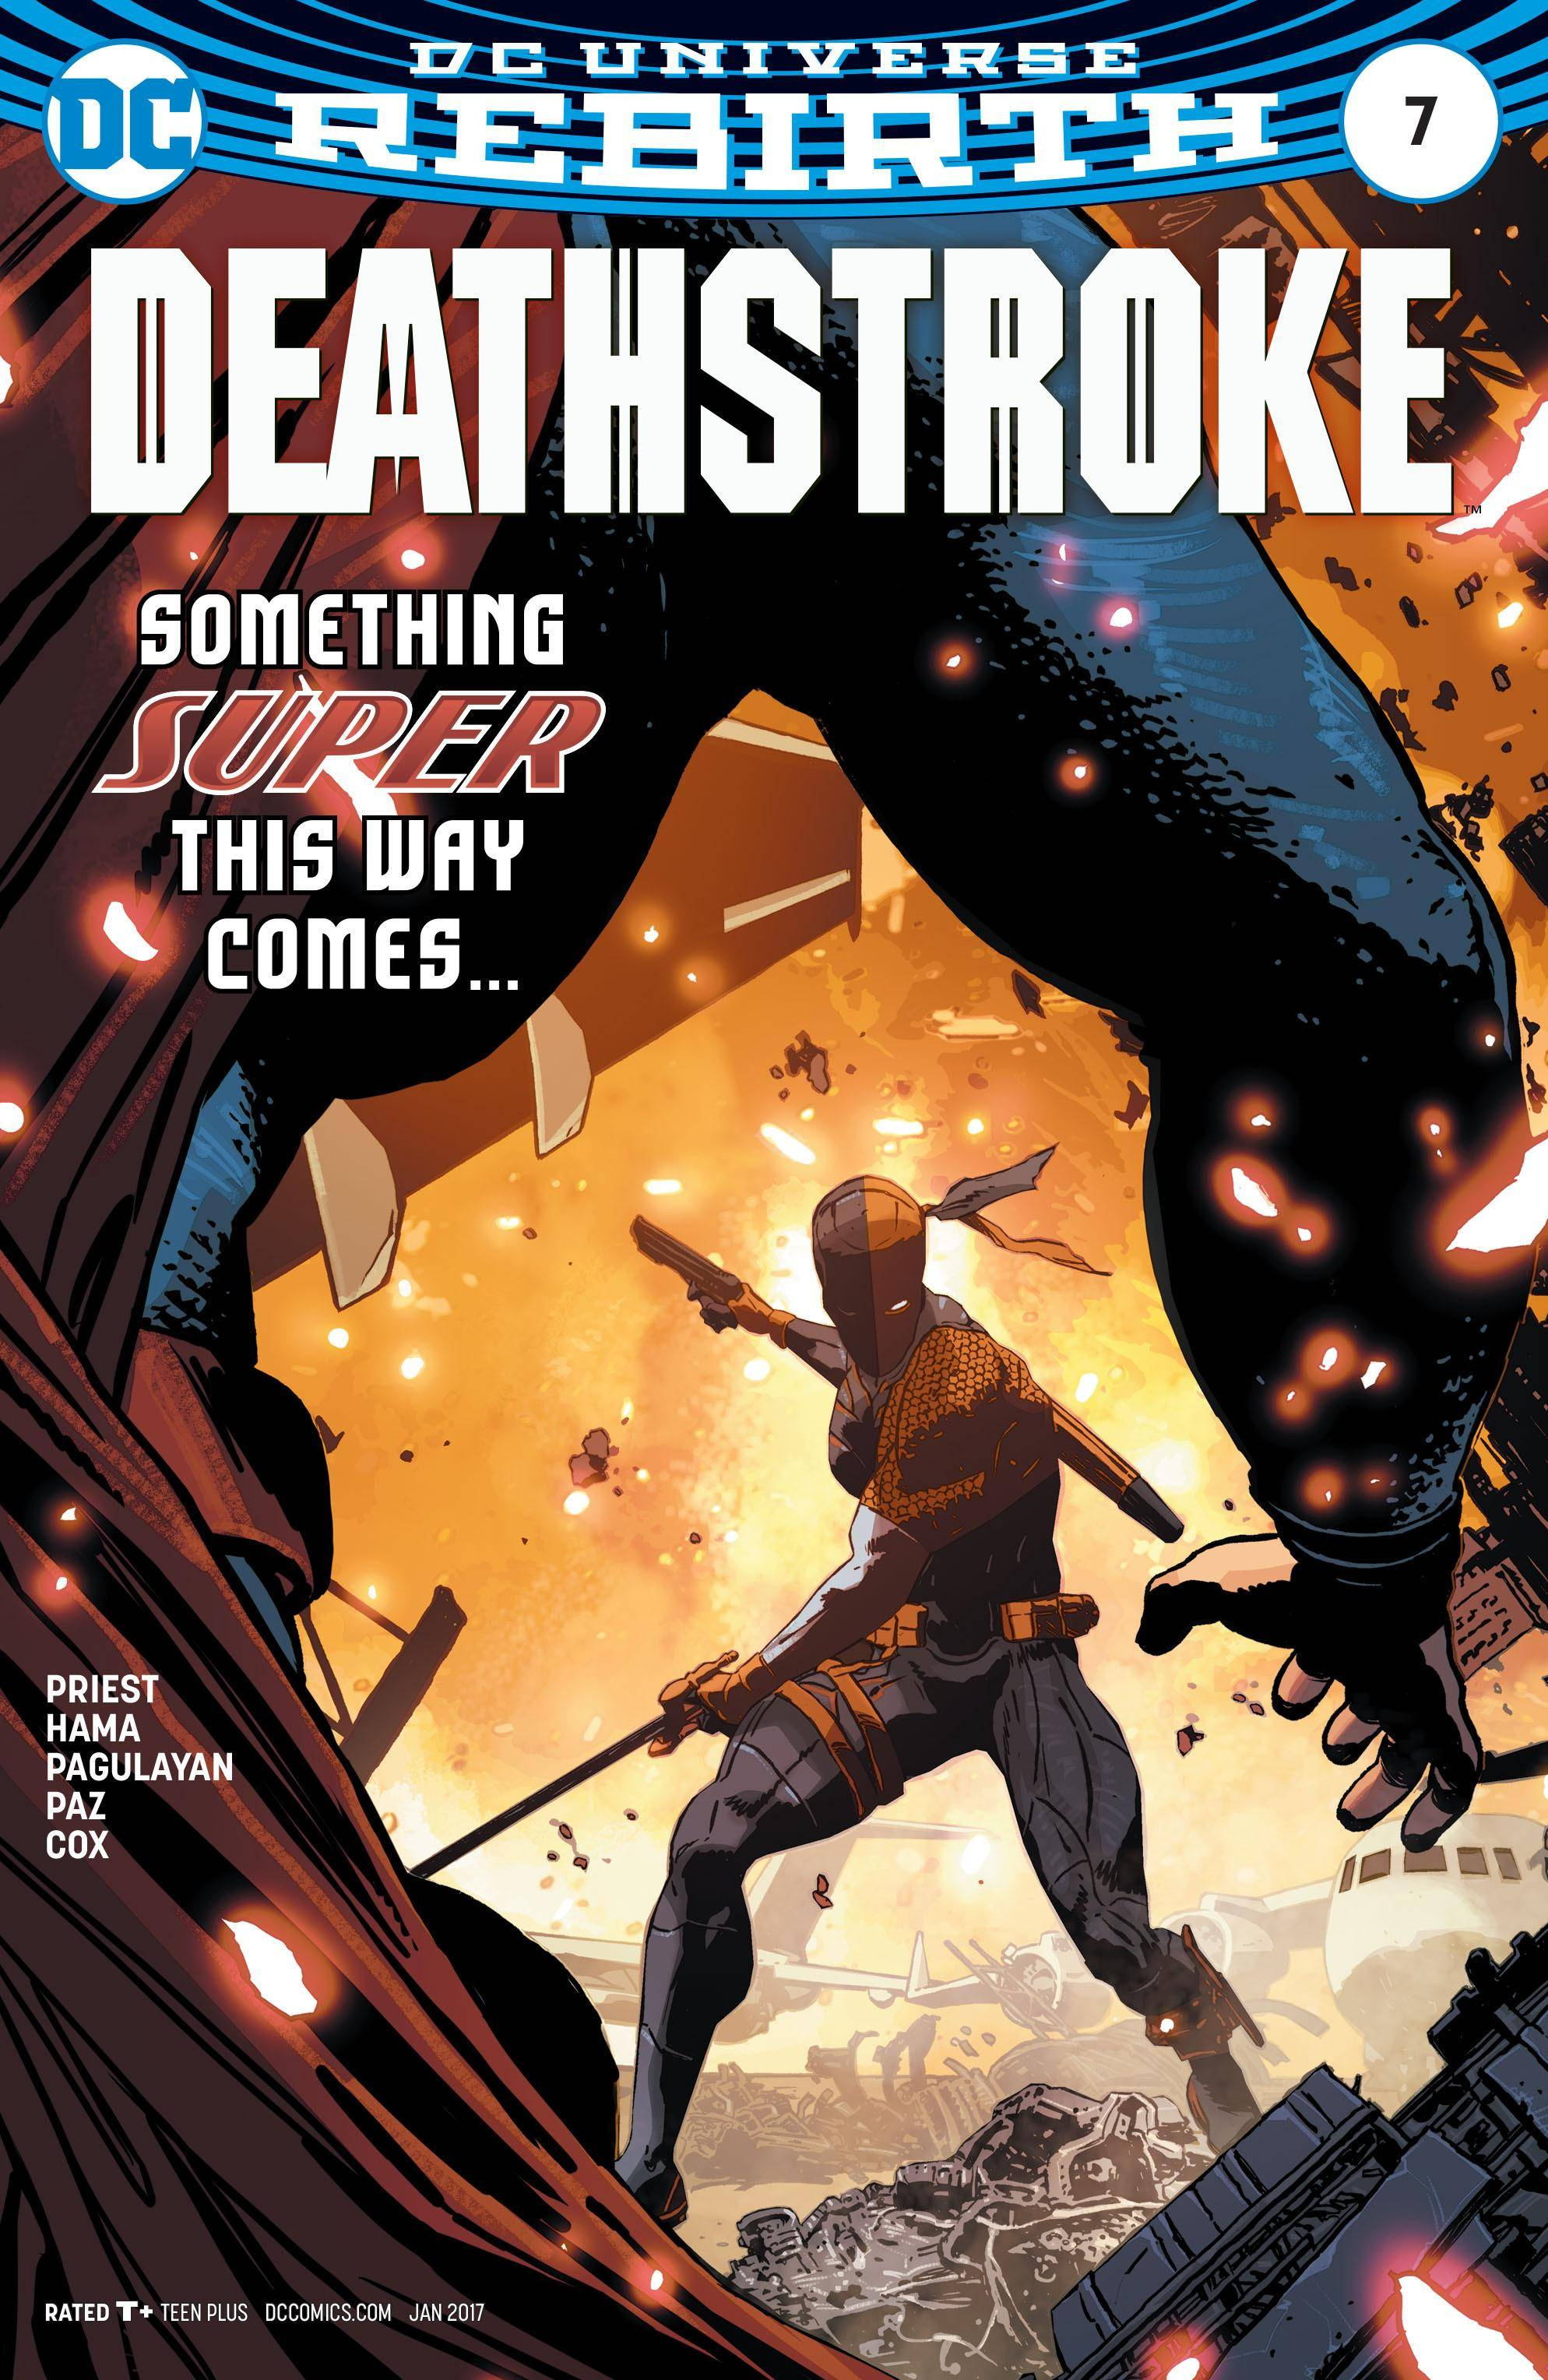 Deathstroke 007 2017 2 covers Digital Zone-Empire